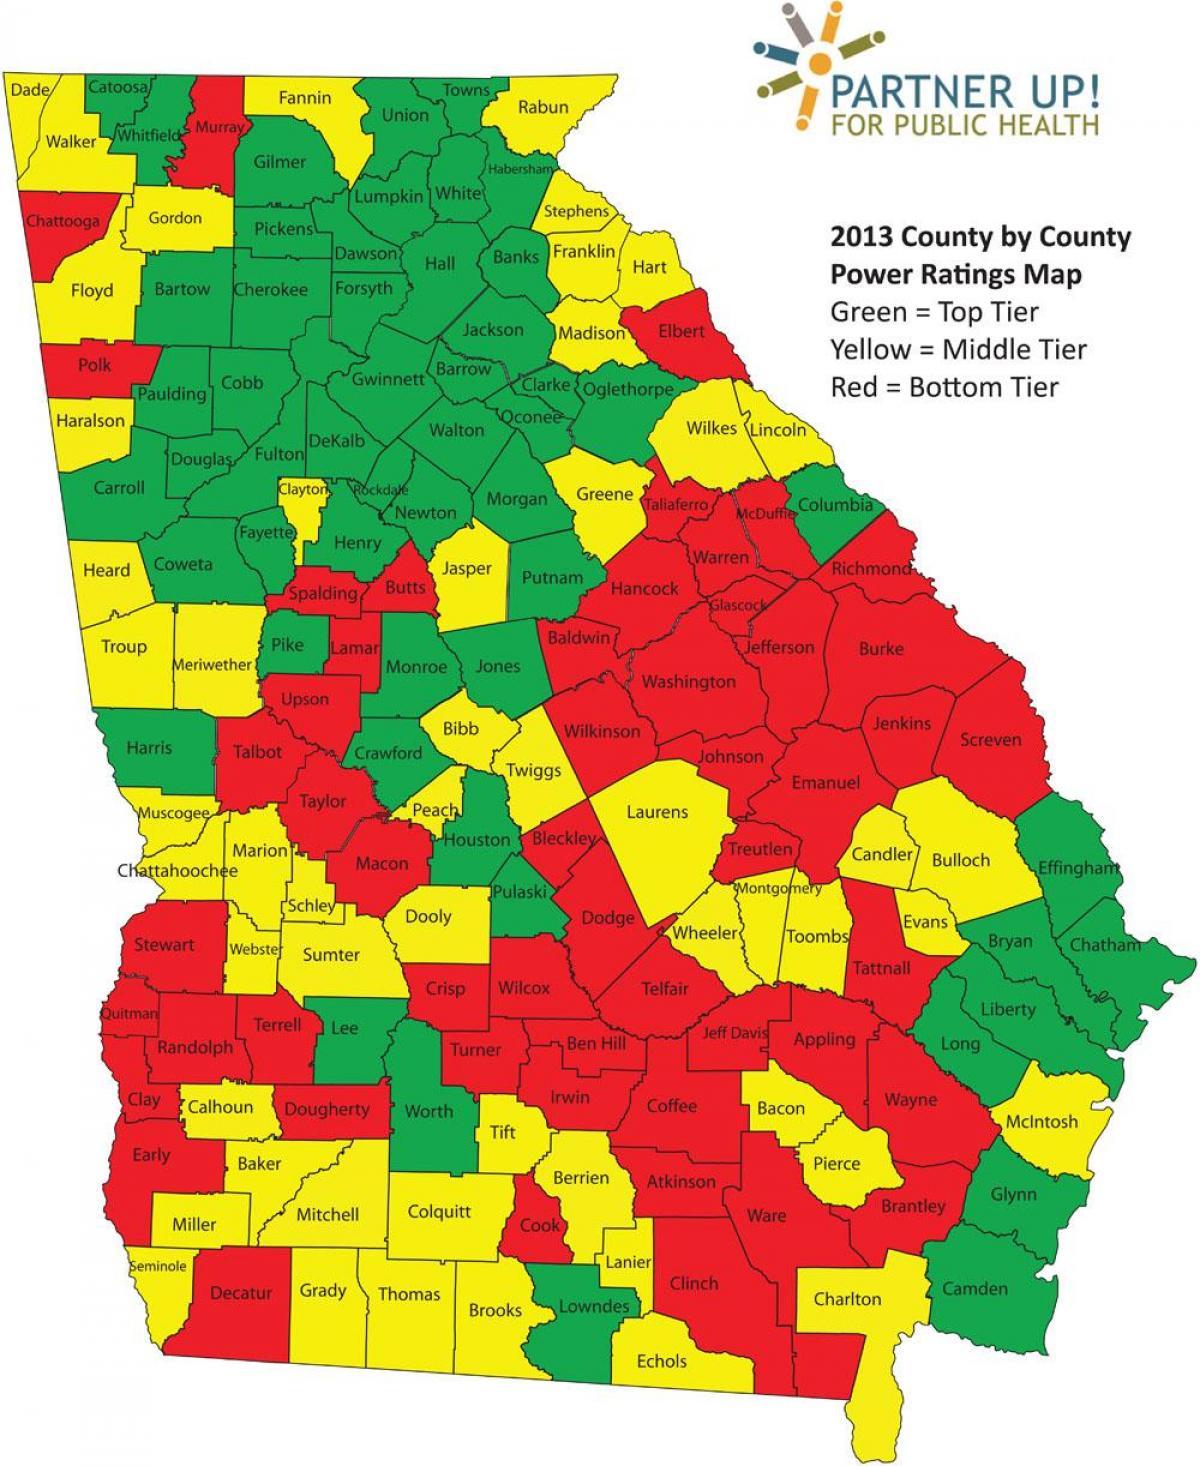 Where Is Atlanta Georgia On The Map Of Usa.Atlanta County Map Atlanta Georgia County Map United States Of